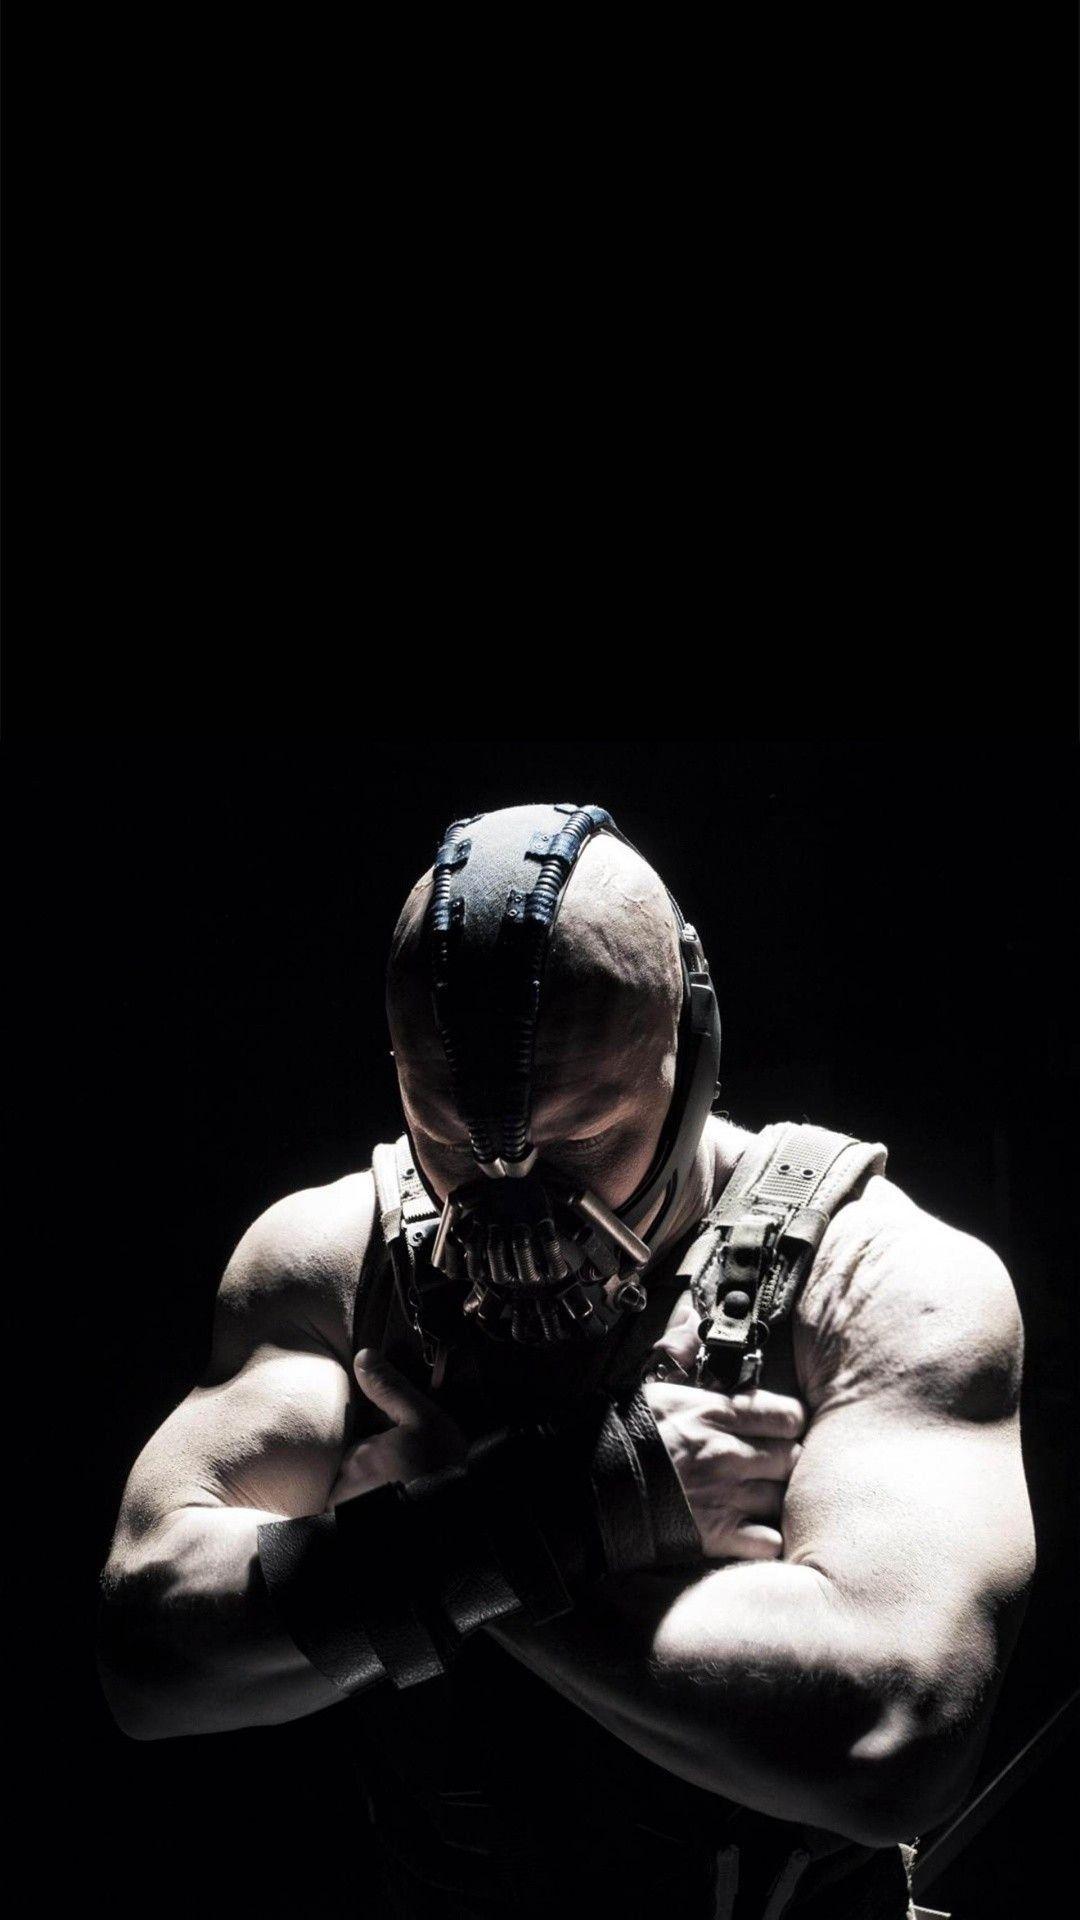 Bane 11 Bane Superhero Wallpaper Movie Artwork